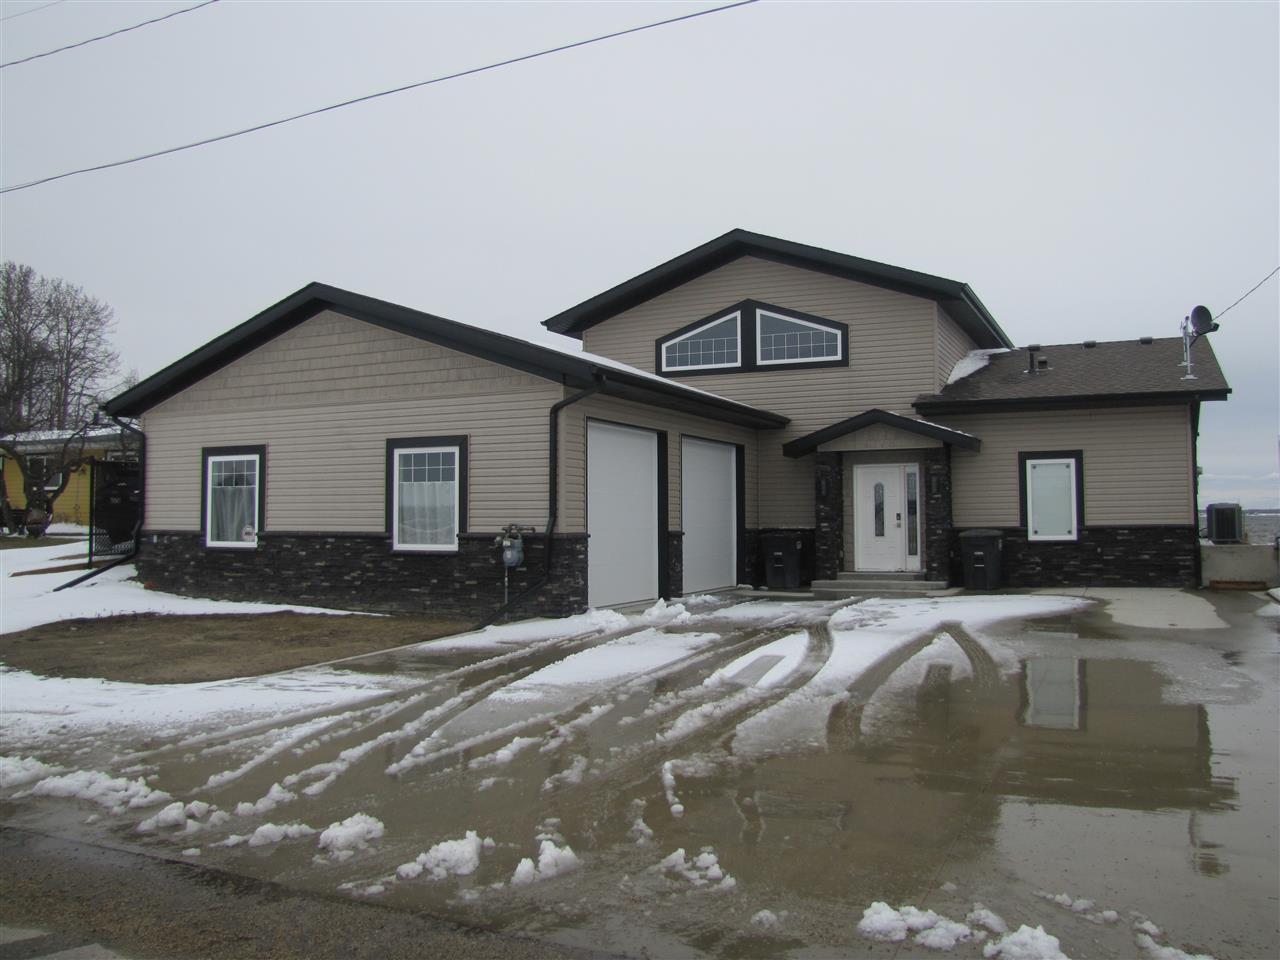 Main Photo: 6808 50 Avenue: Rural Lac Ste. Anne County House for sale : MLS®# E4185216